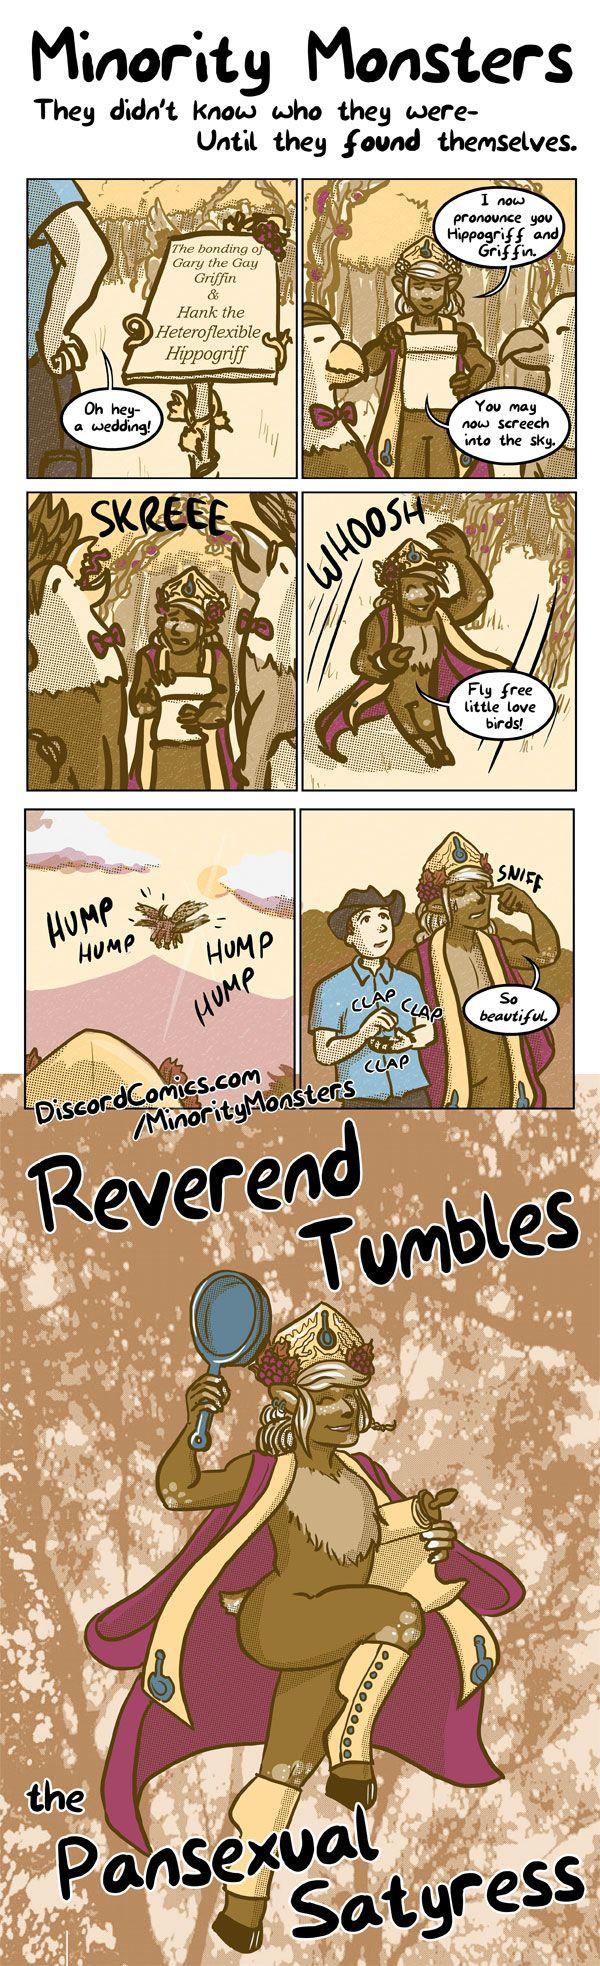 06-reverend-tumbles